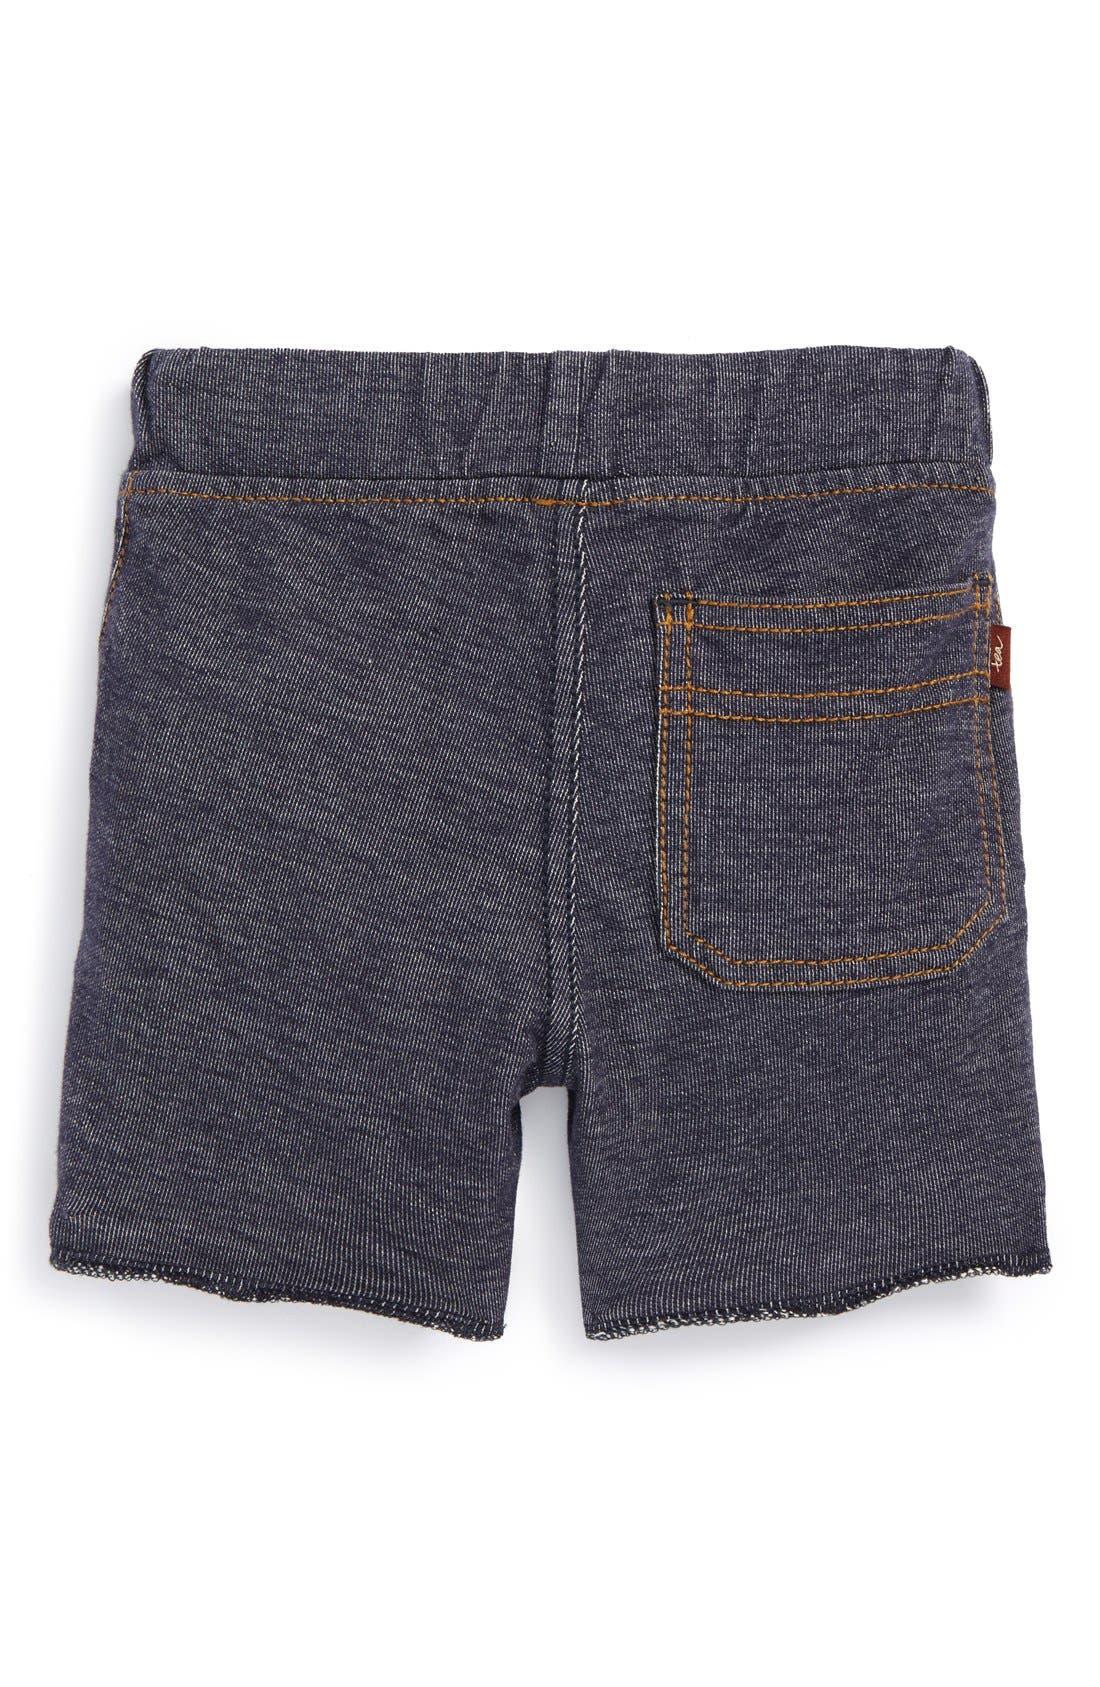 Denim Look Shorts,                             Alternate thumbnail 3, color,                             411